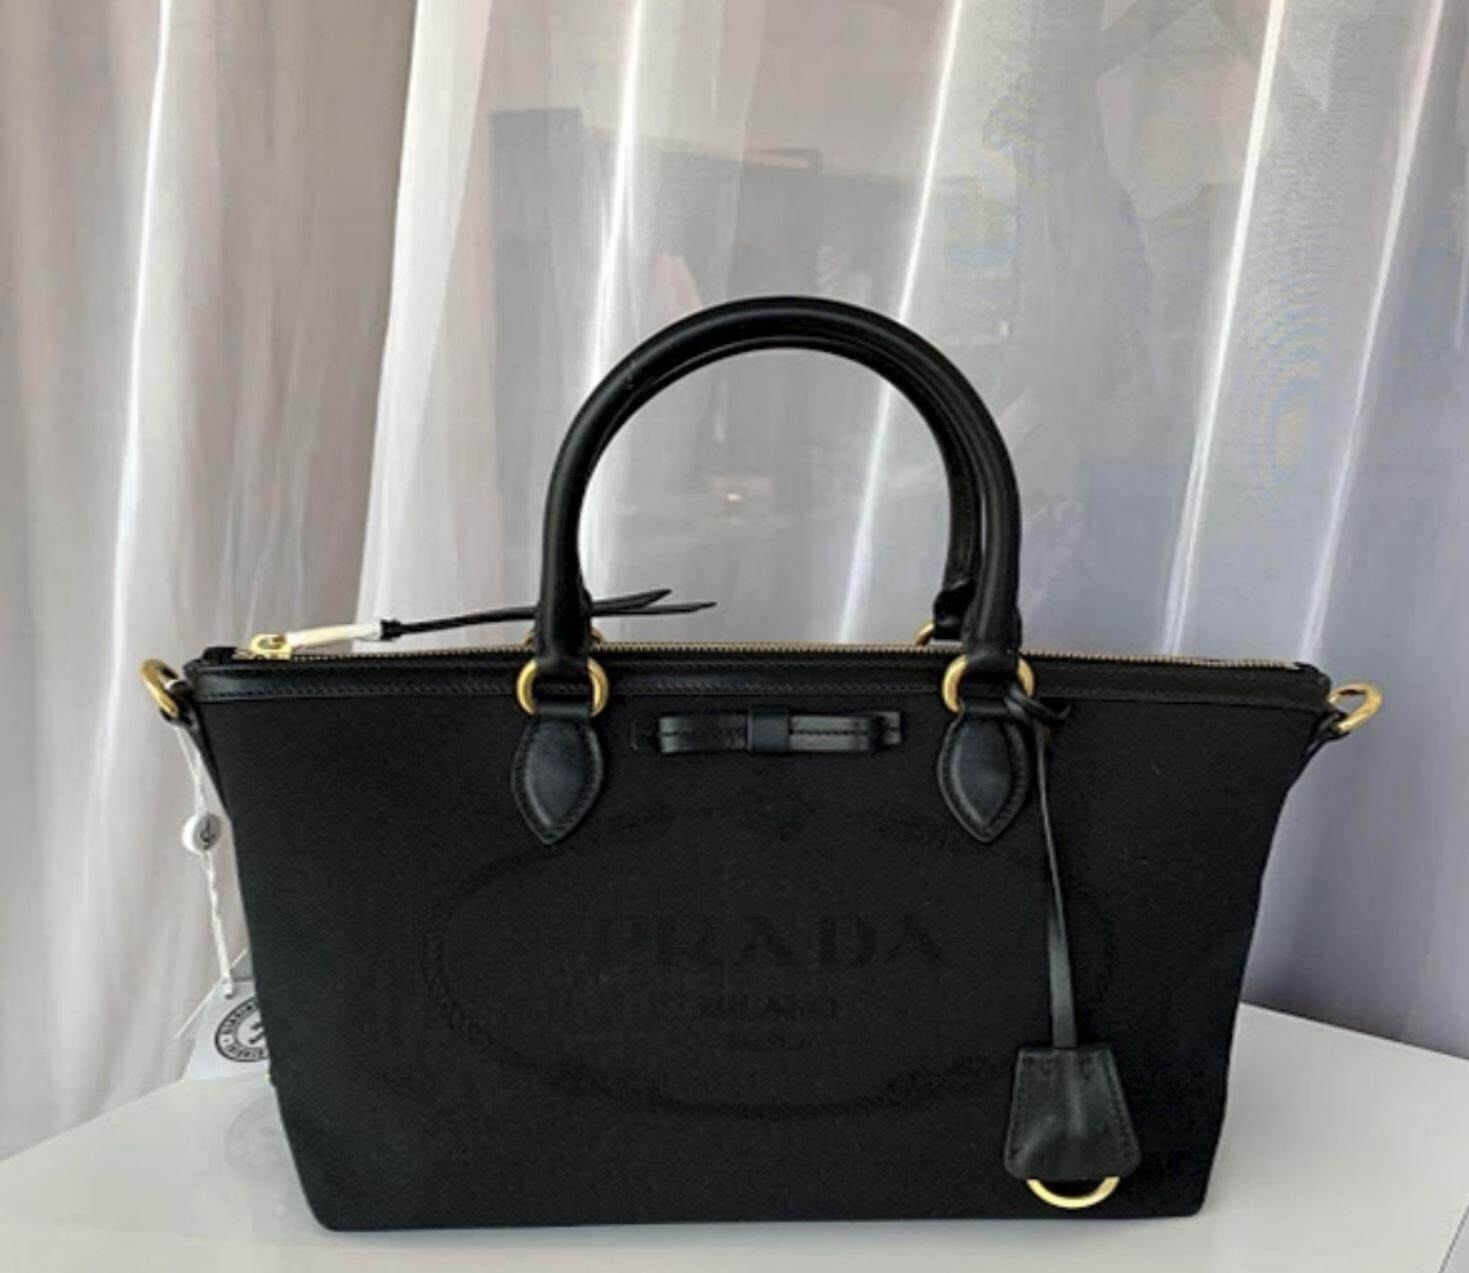 5317454e2b4f Prada,Grundig Women Tote Bags price in Malaysia - Best Prada,Grundig ...